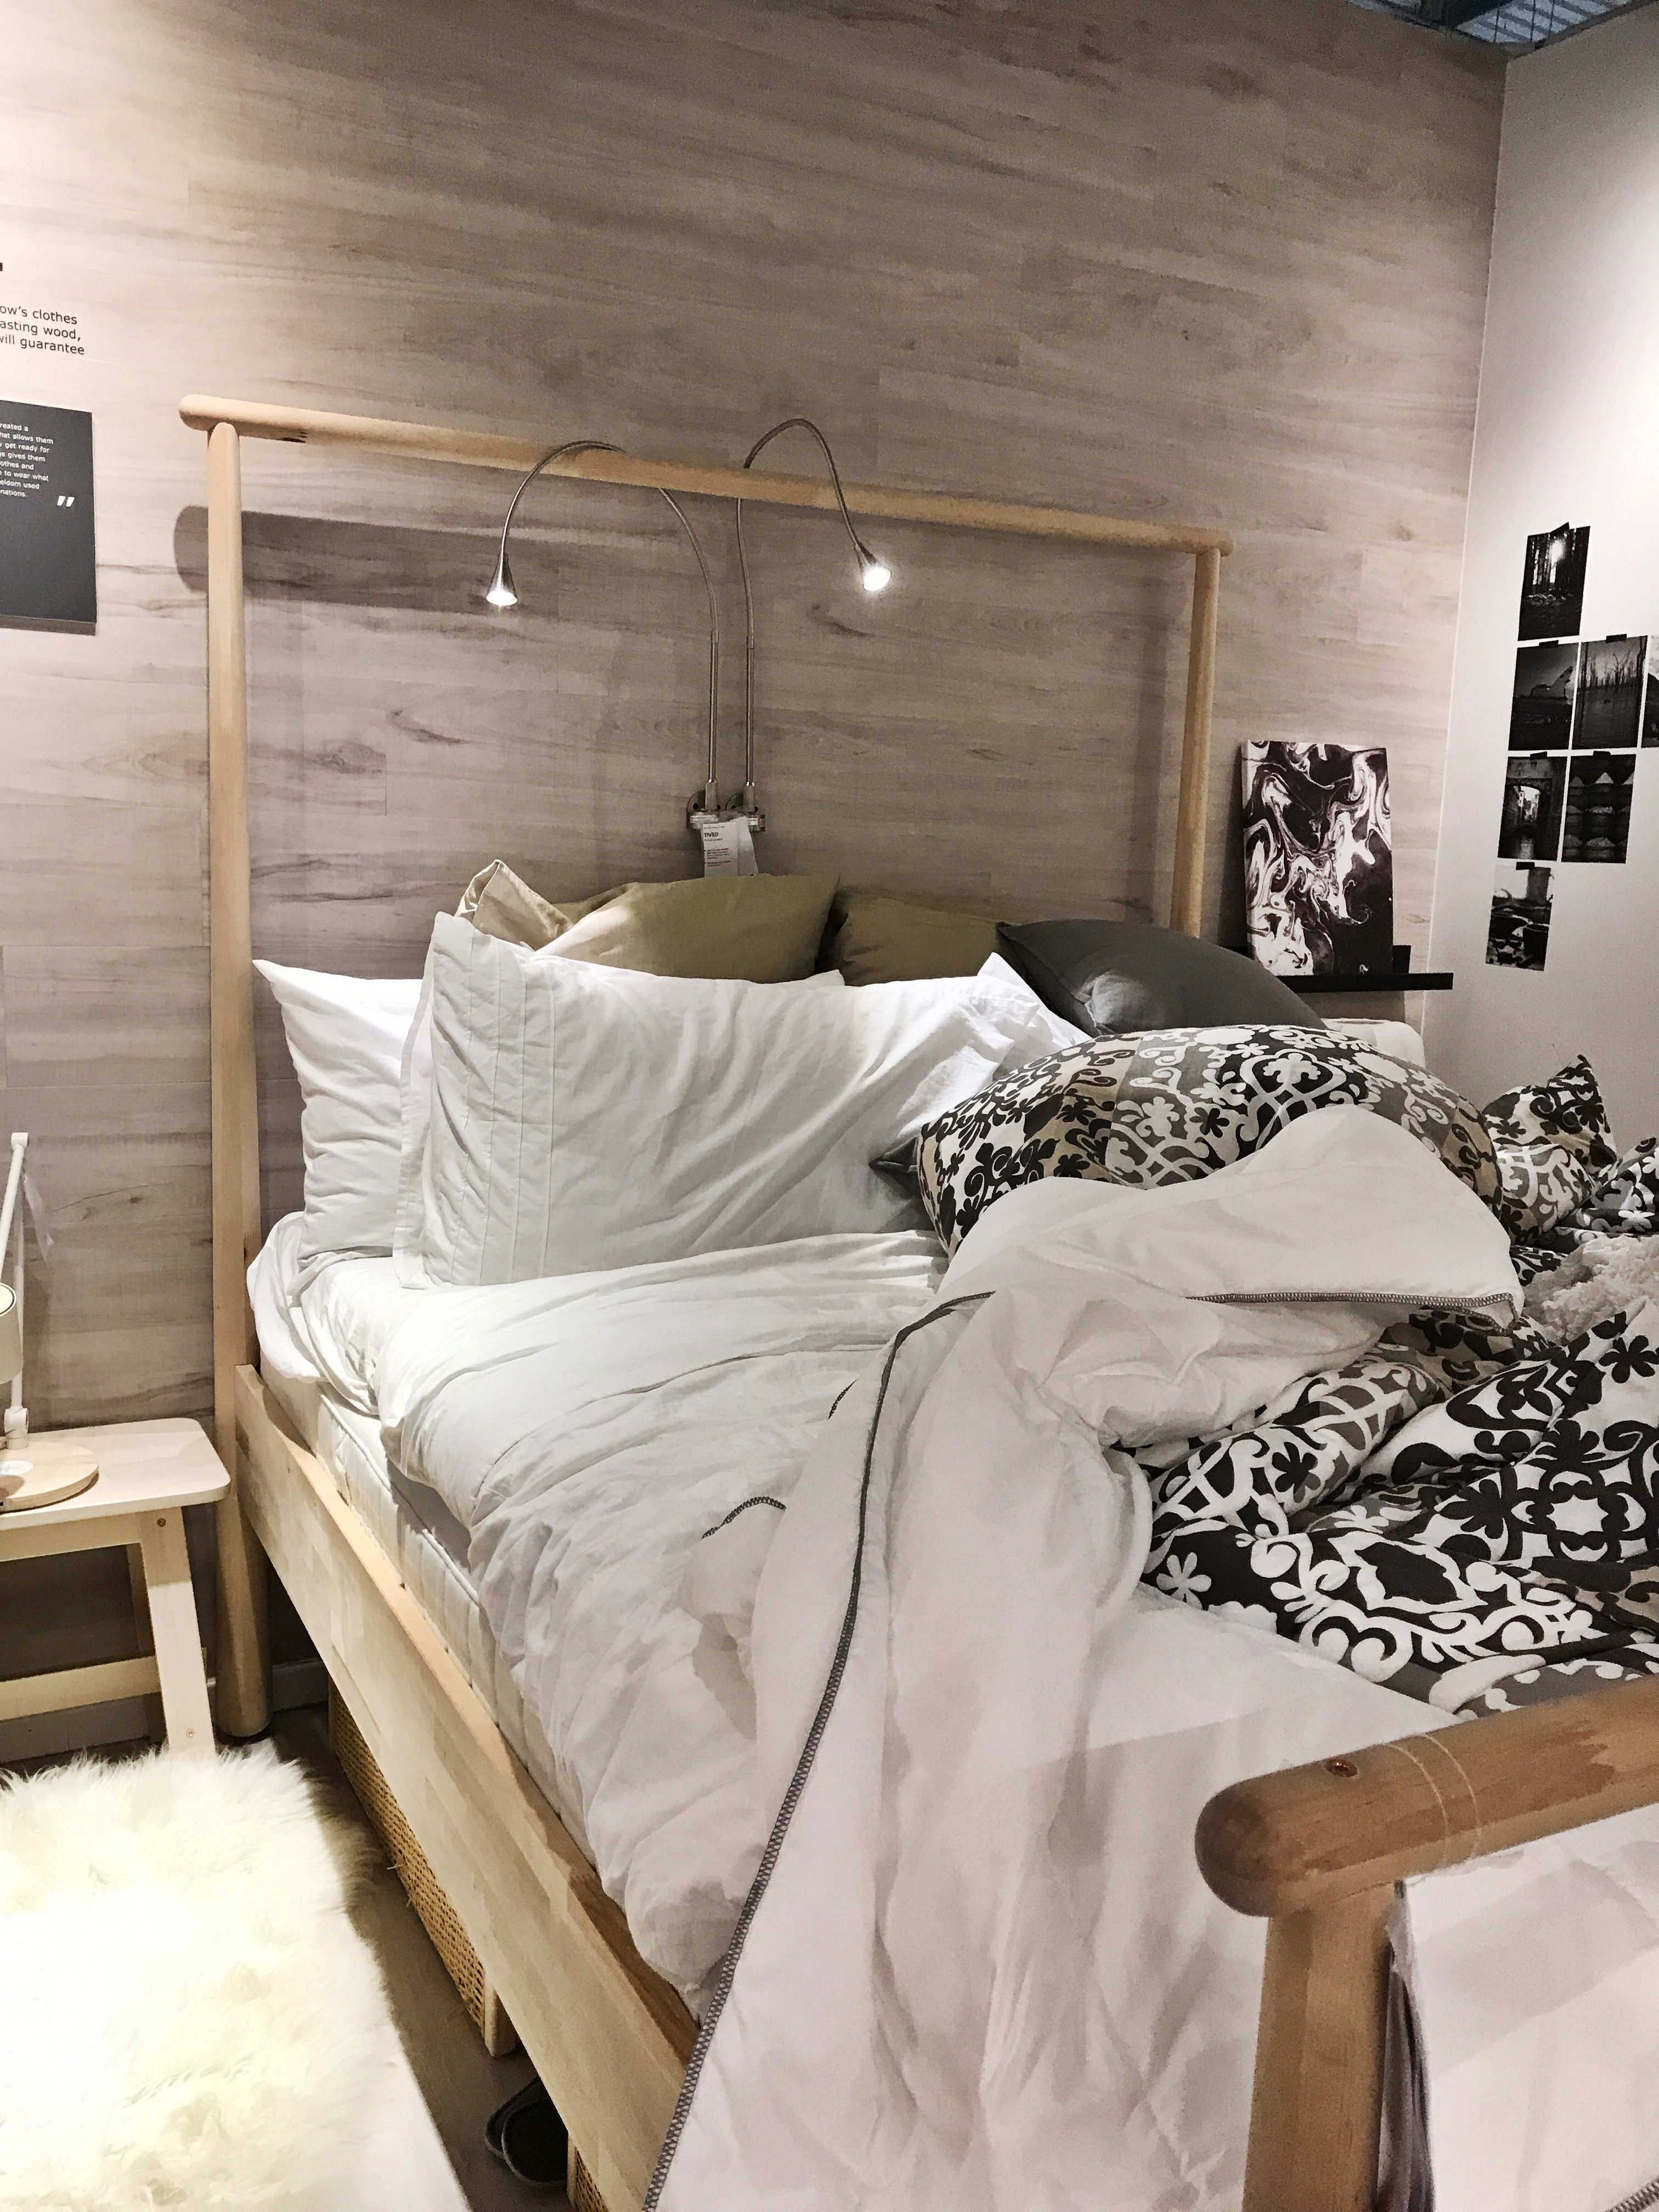 Nook Bedroom Ideas Pin by Charis Soh